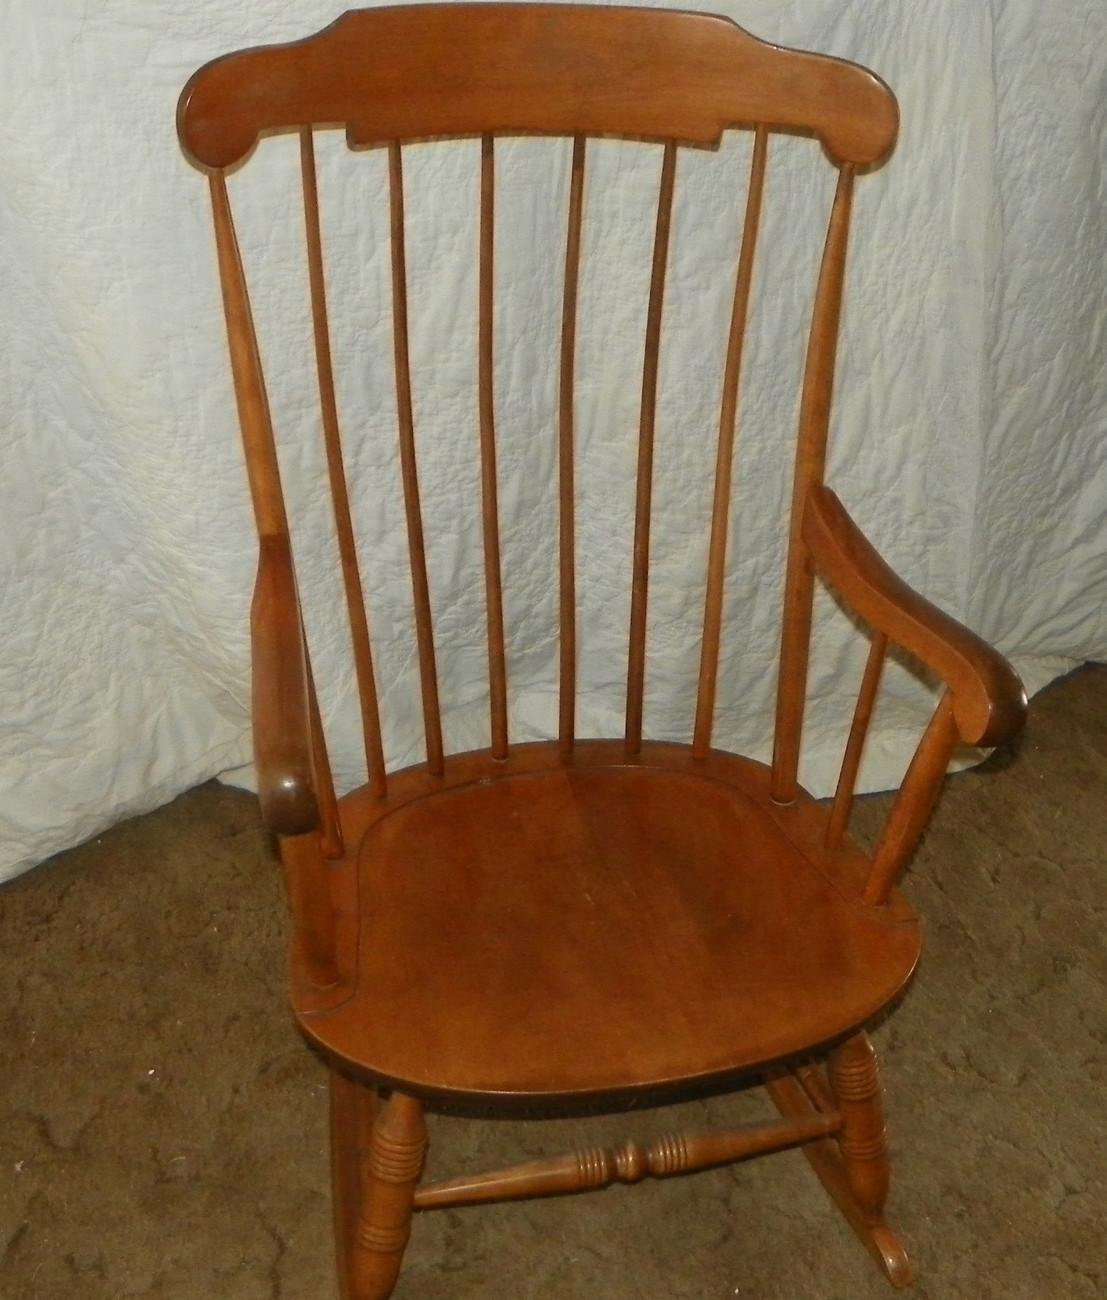 Maple Nichols and Stone Rocker Rocking Chair - Post-1950